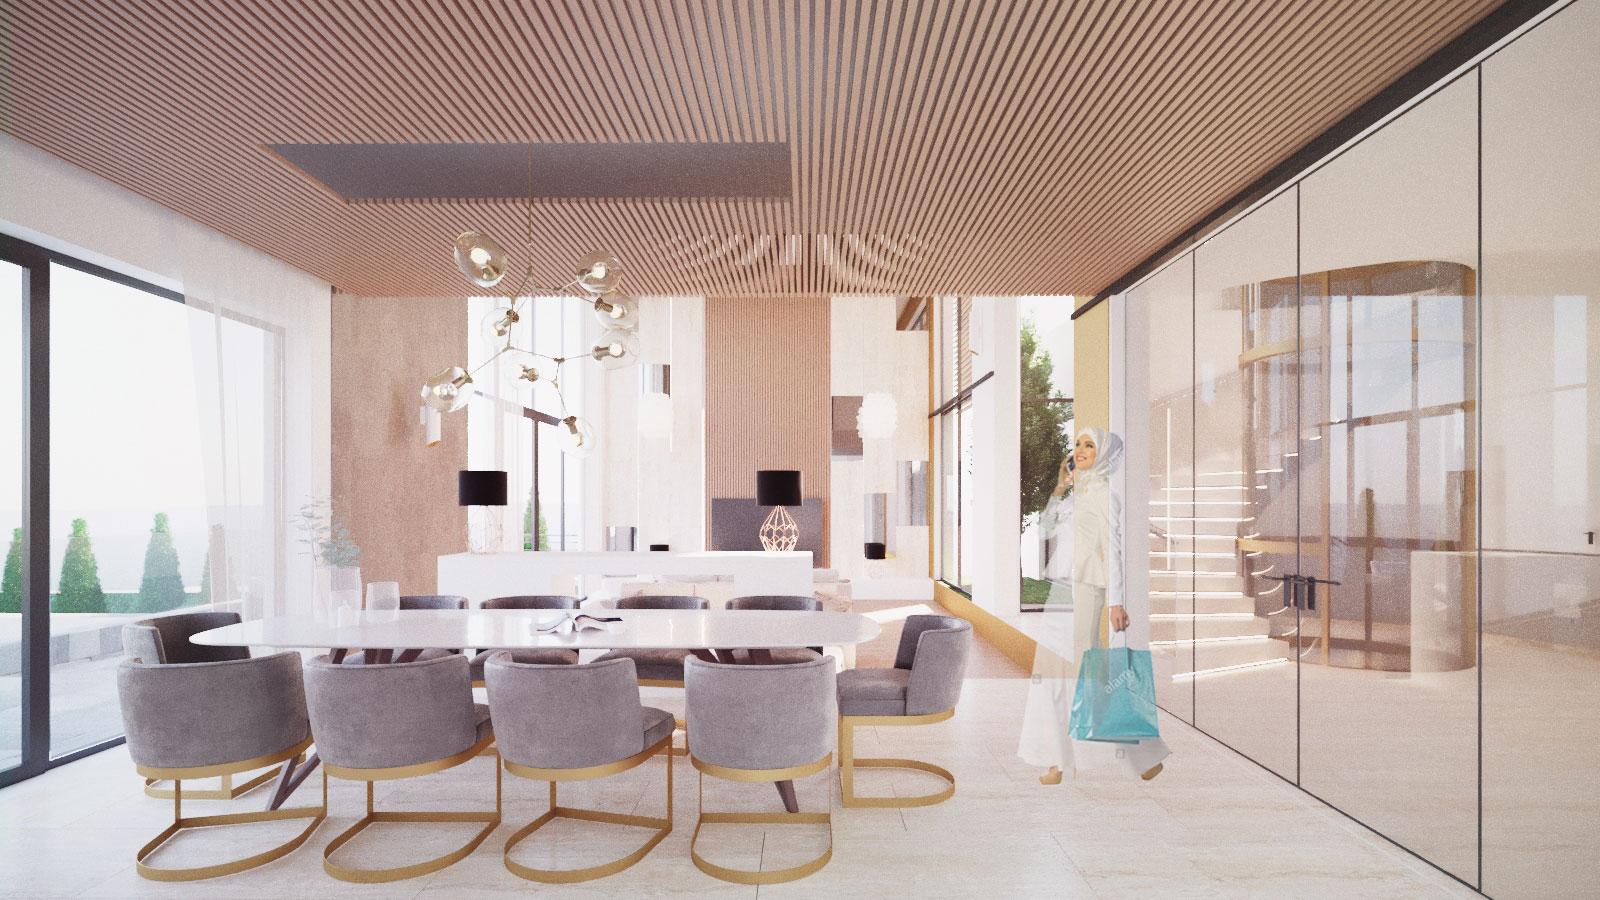 https://nbc-arhitect.ro/wp-content/uploads/2020/10/NBC-Arhitect-_-residences-_-Mogo-Villa-_-Romania-_-interior-view_18.jpg